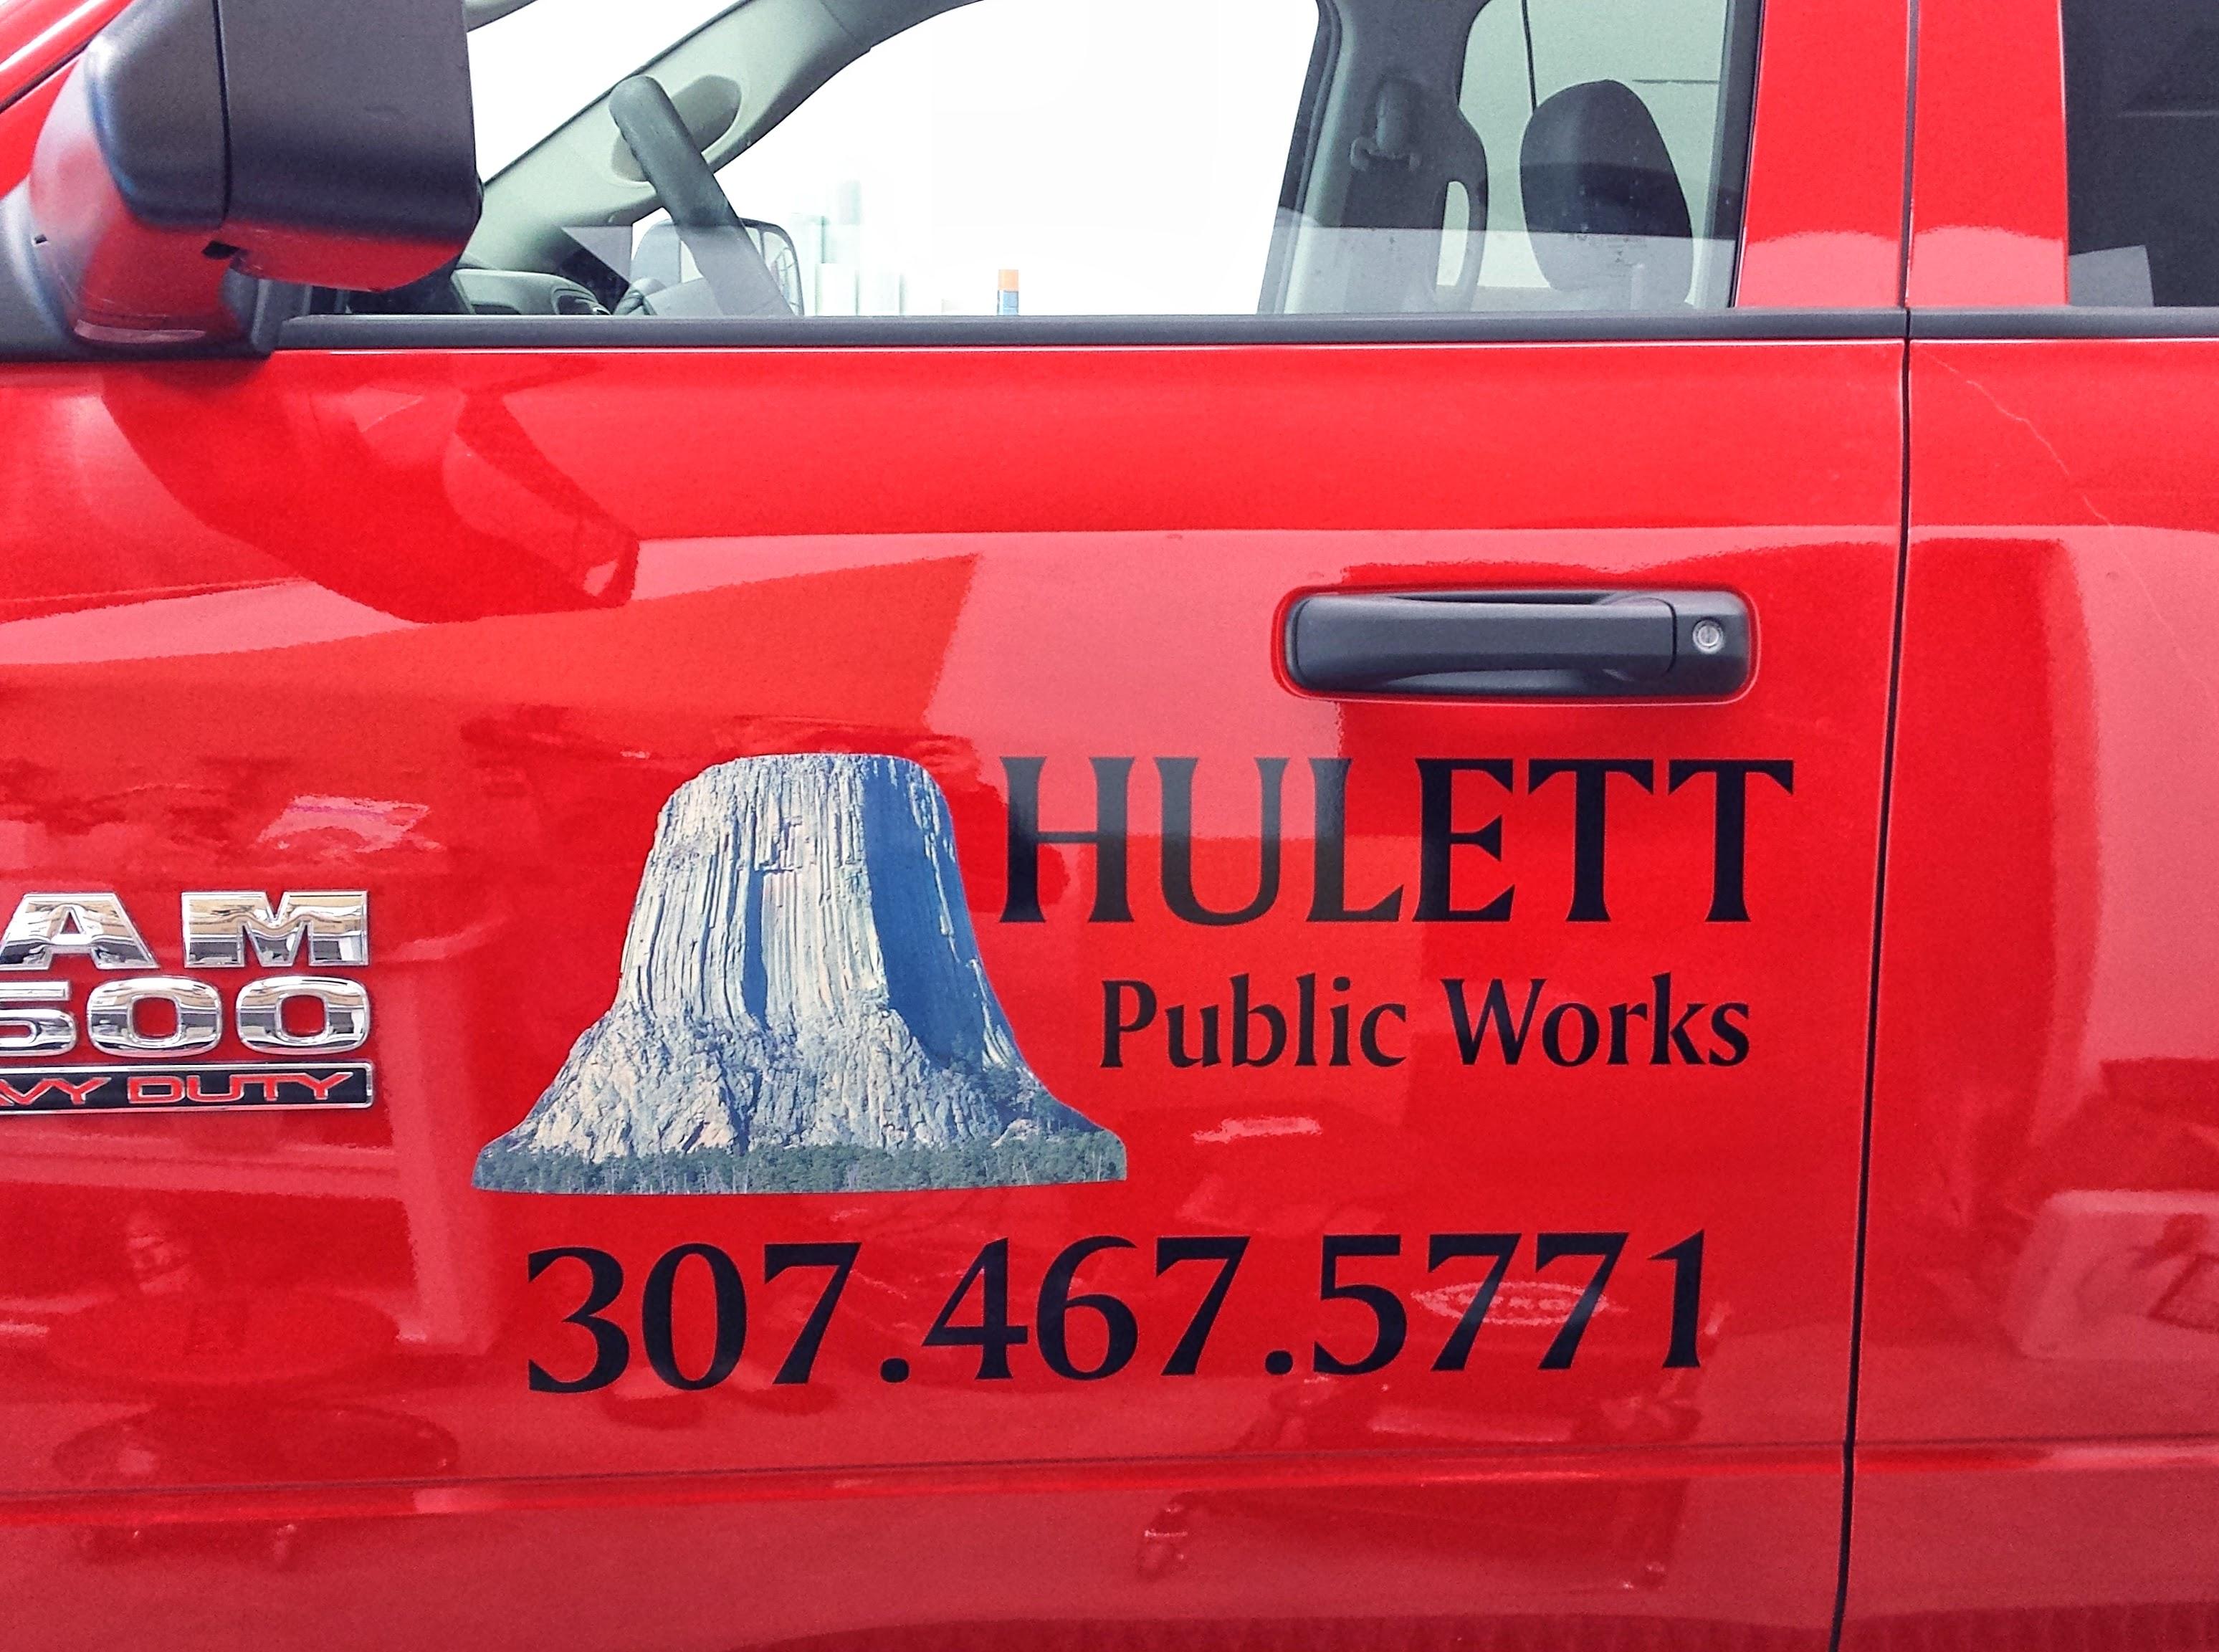 Hulett Public Works